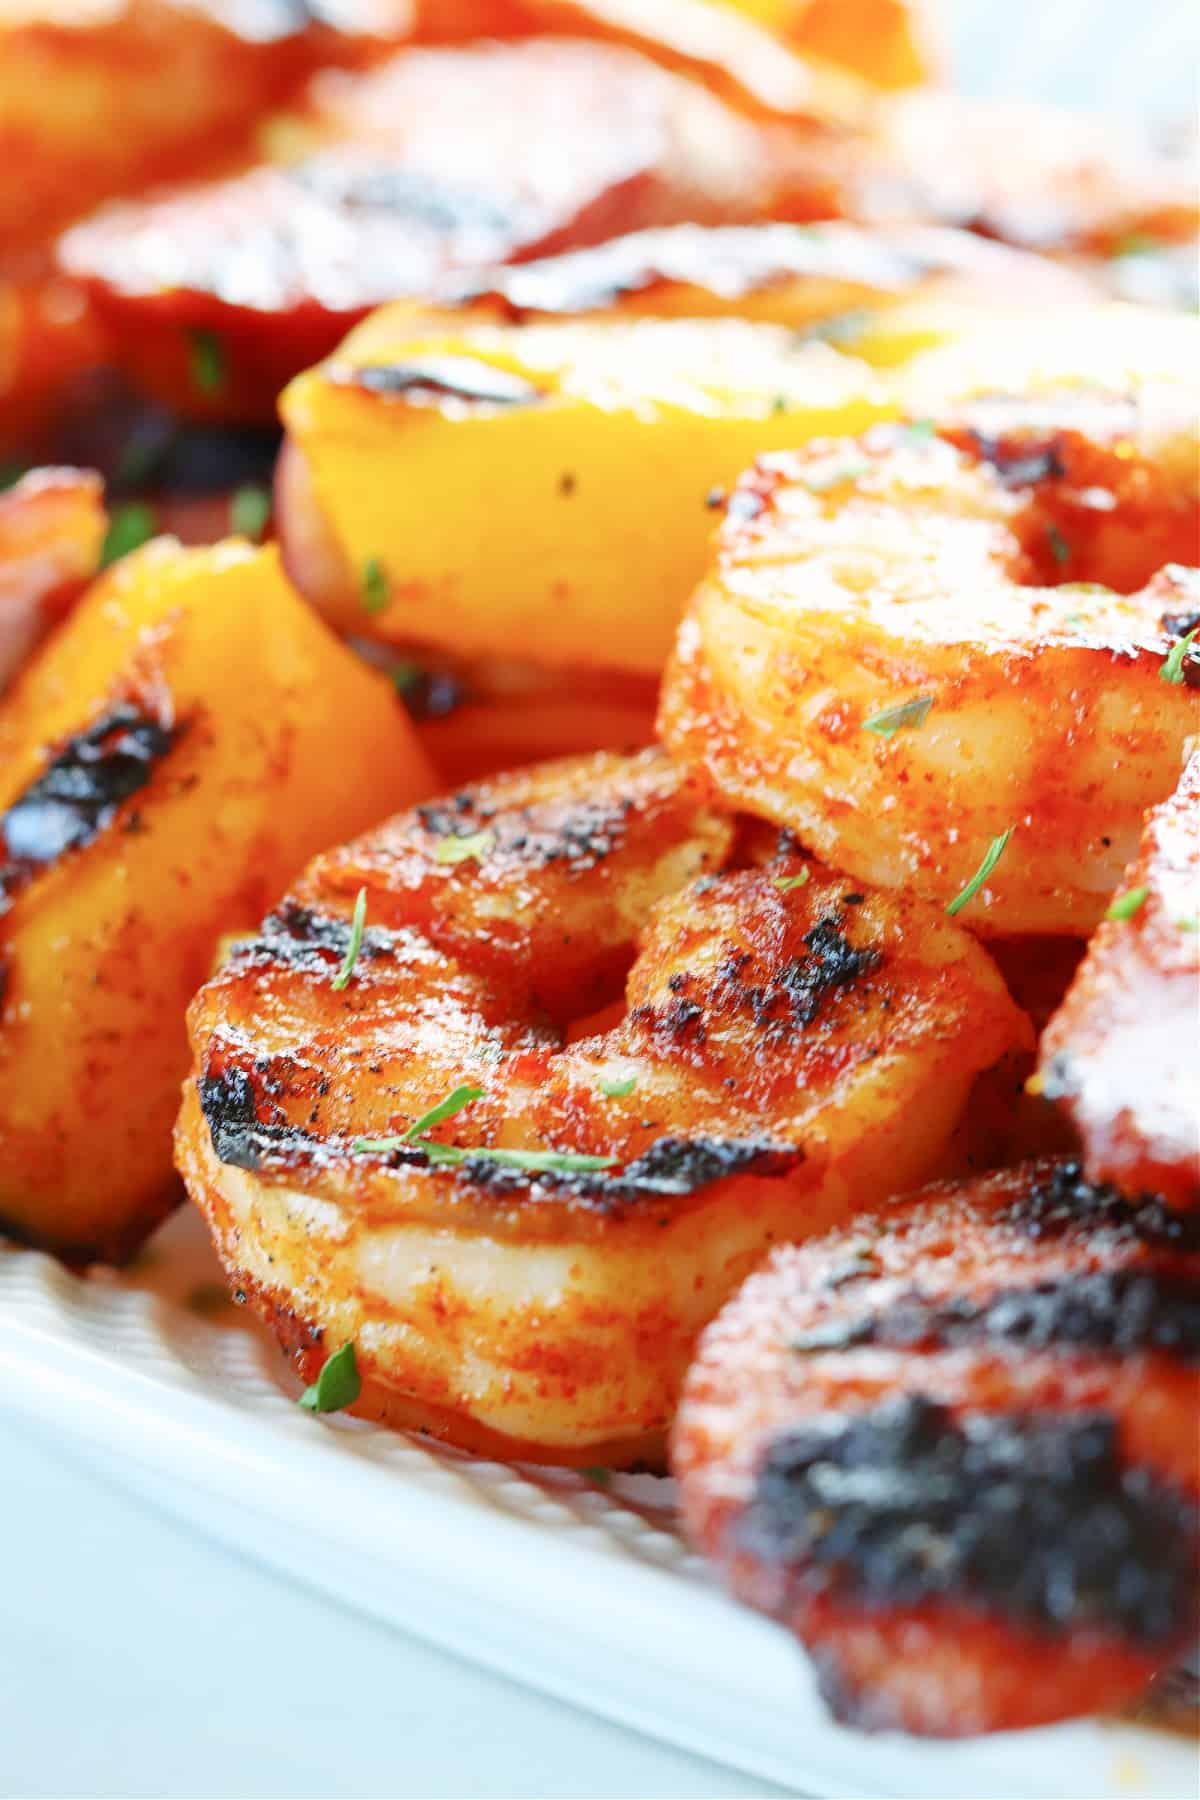 shrimp and sausage skewers 2 Shrimp and Sausage Skewers (Keto Friendly)